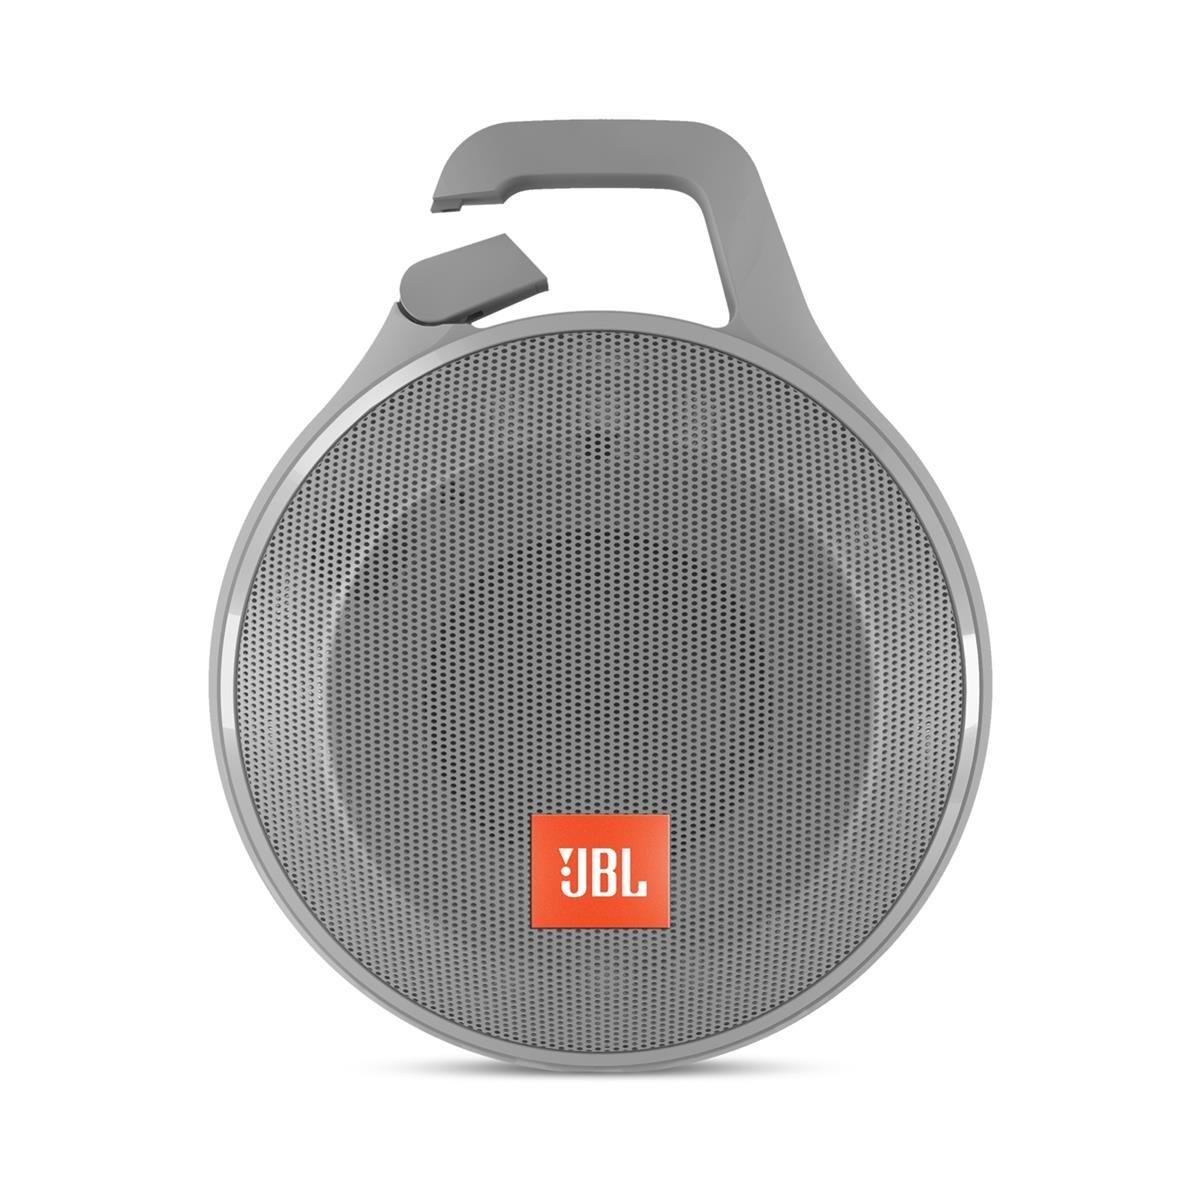 JBL Clip 2 Bluetooth Speaker - REVIEW - YouTube